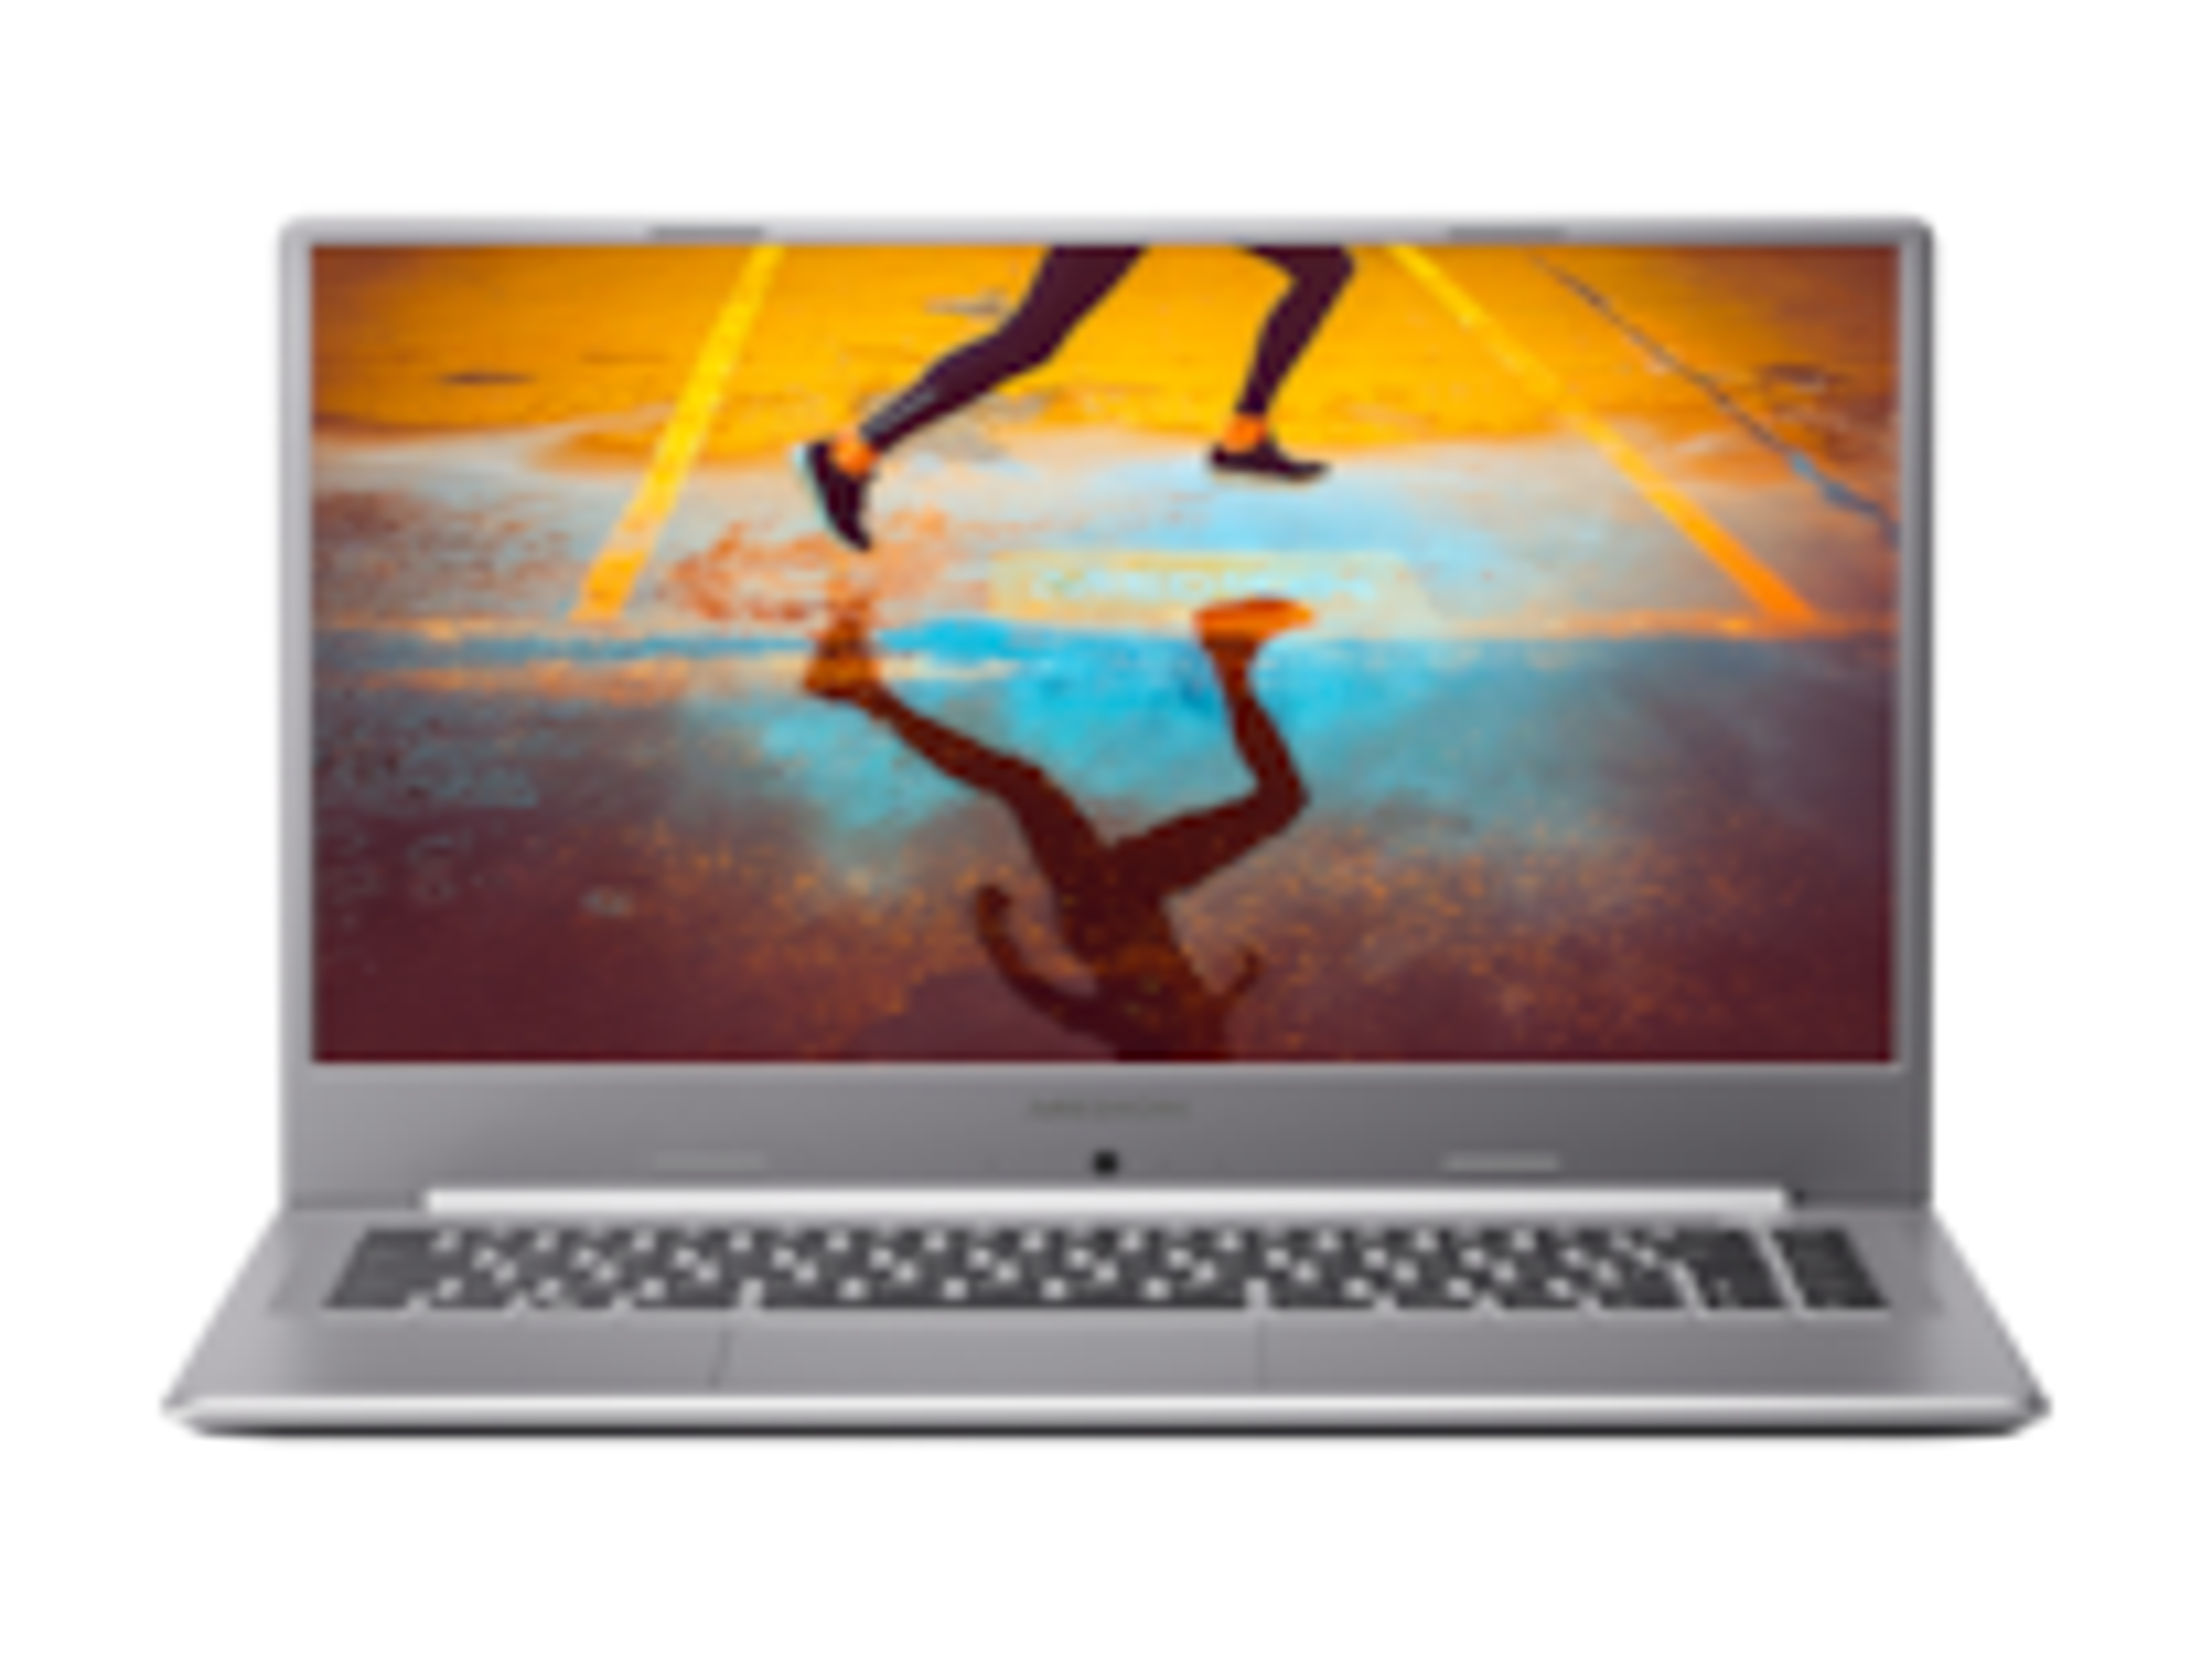 MEDION AKOYA S15447 i7 laptop